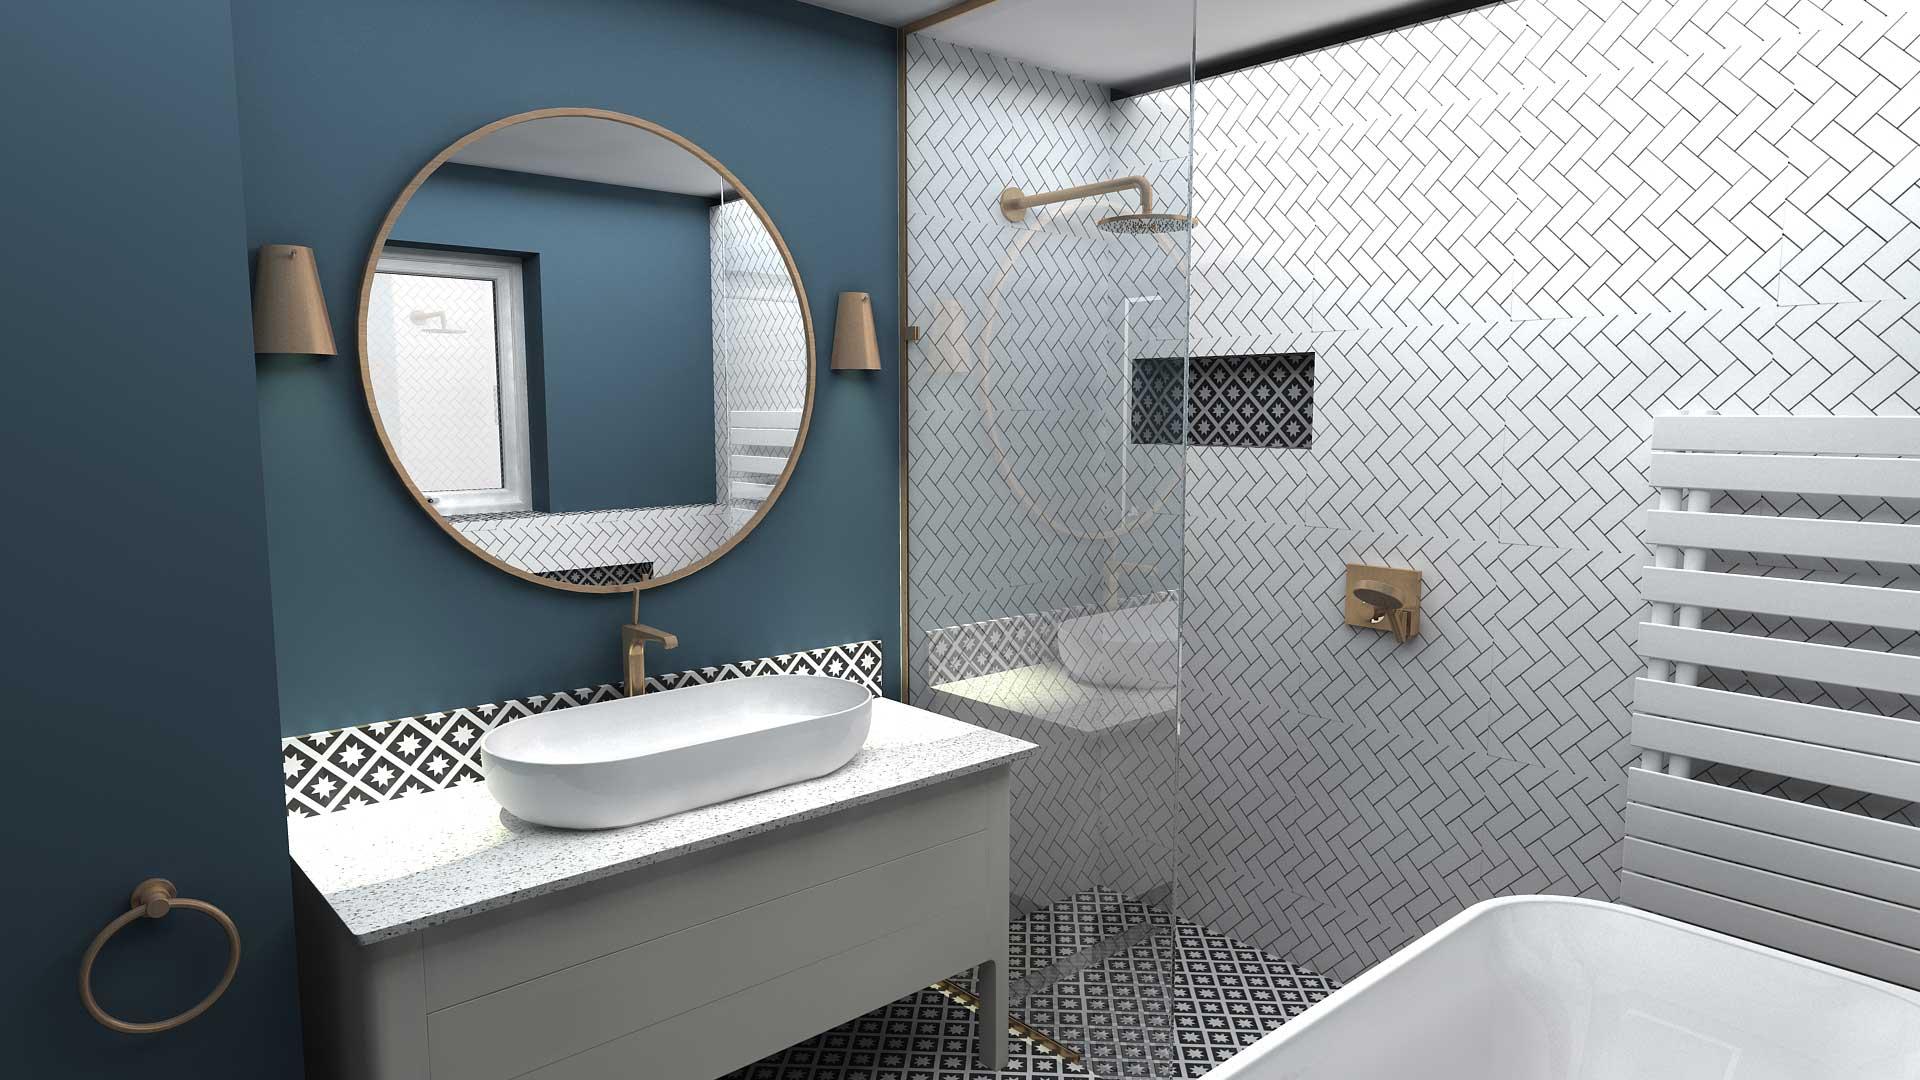 Virtual Worlds bathroom design software